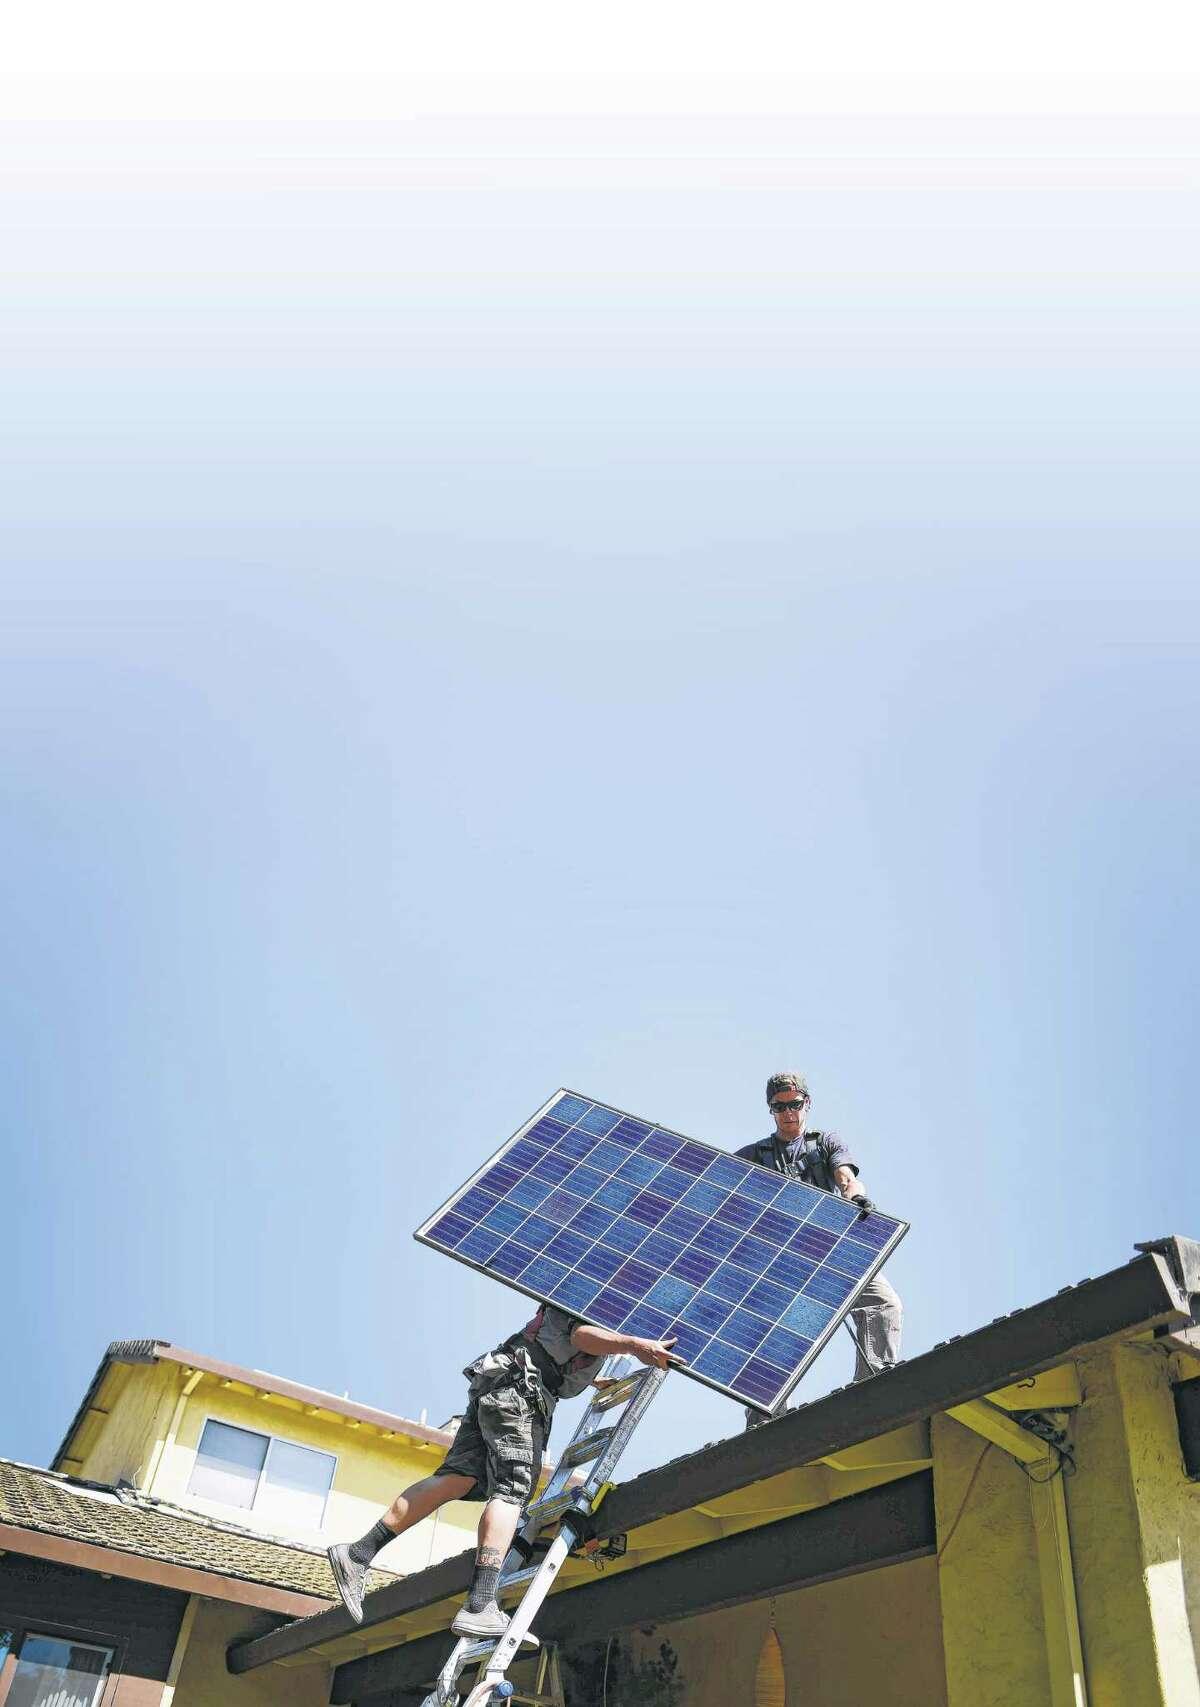 SunRun's Brandon Anderson and Will LaRocque prepare to install a solar panel on a house in Sunnyvale, Calif.